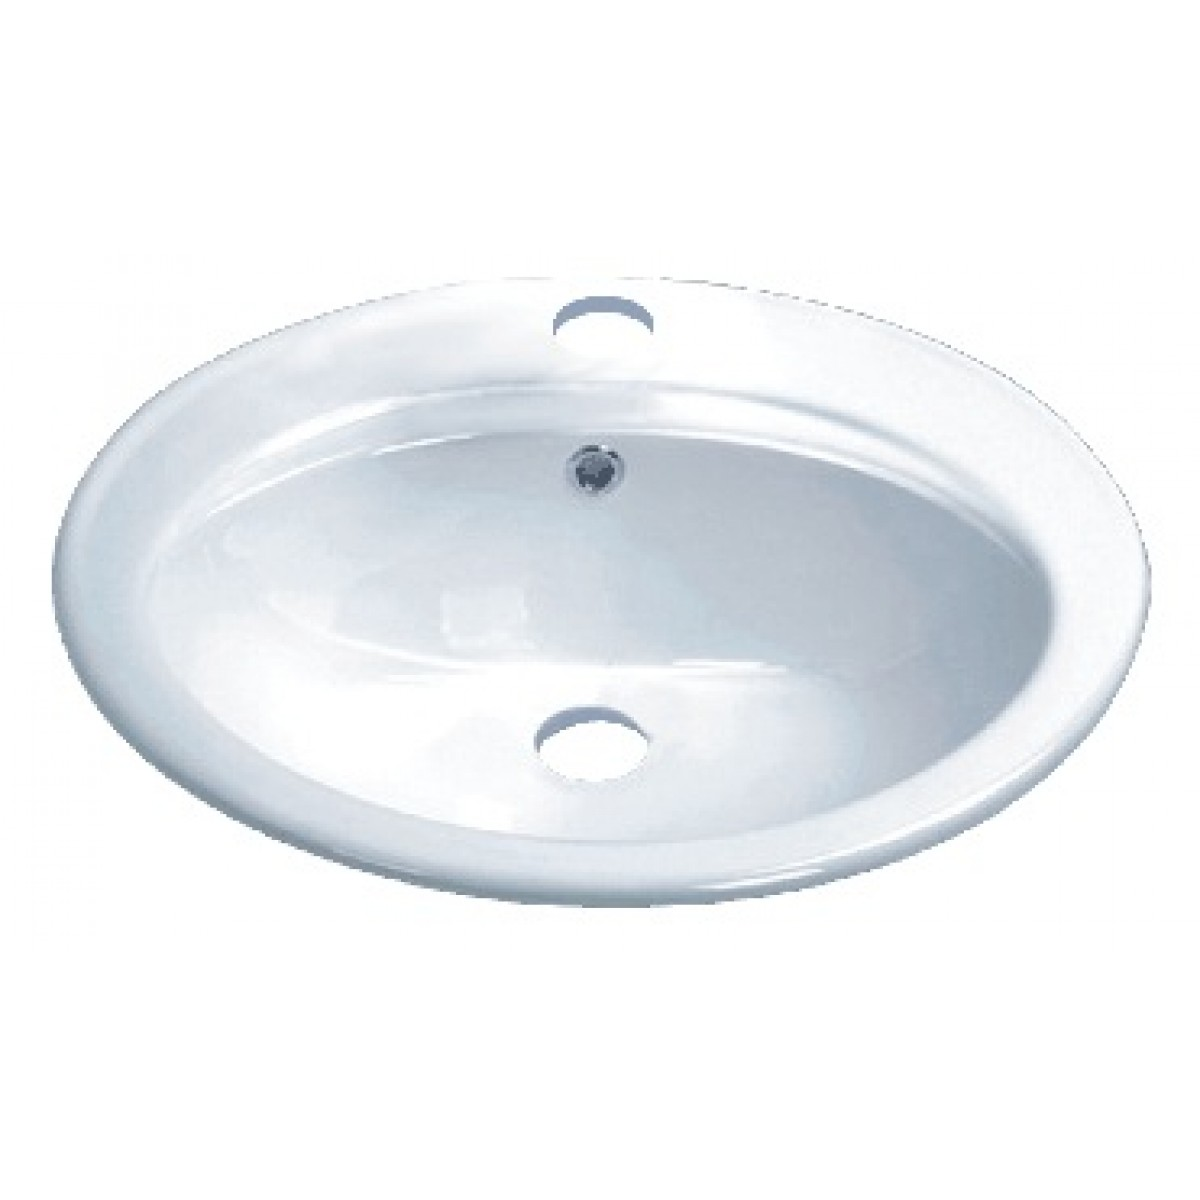 Drop In Vessel Sink : ... Ceramic Vanity Drop In Bathroom Vessel Sink - 22-1/4 x 19 x 8 Inch